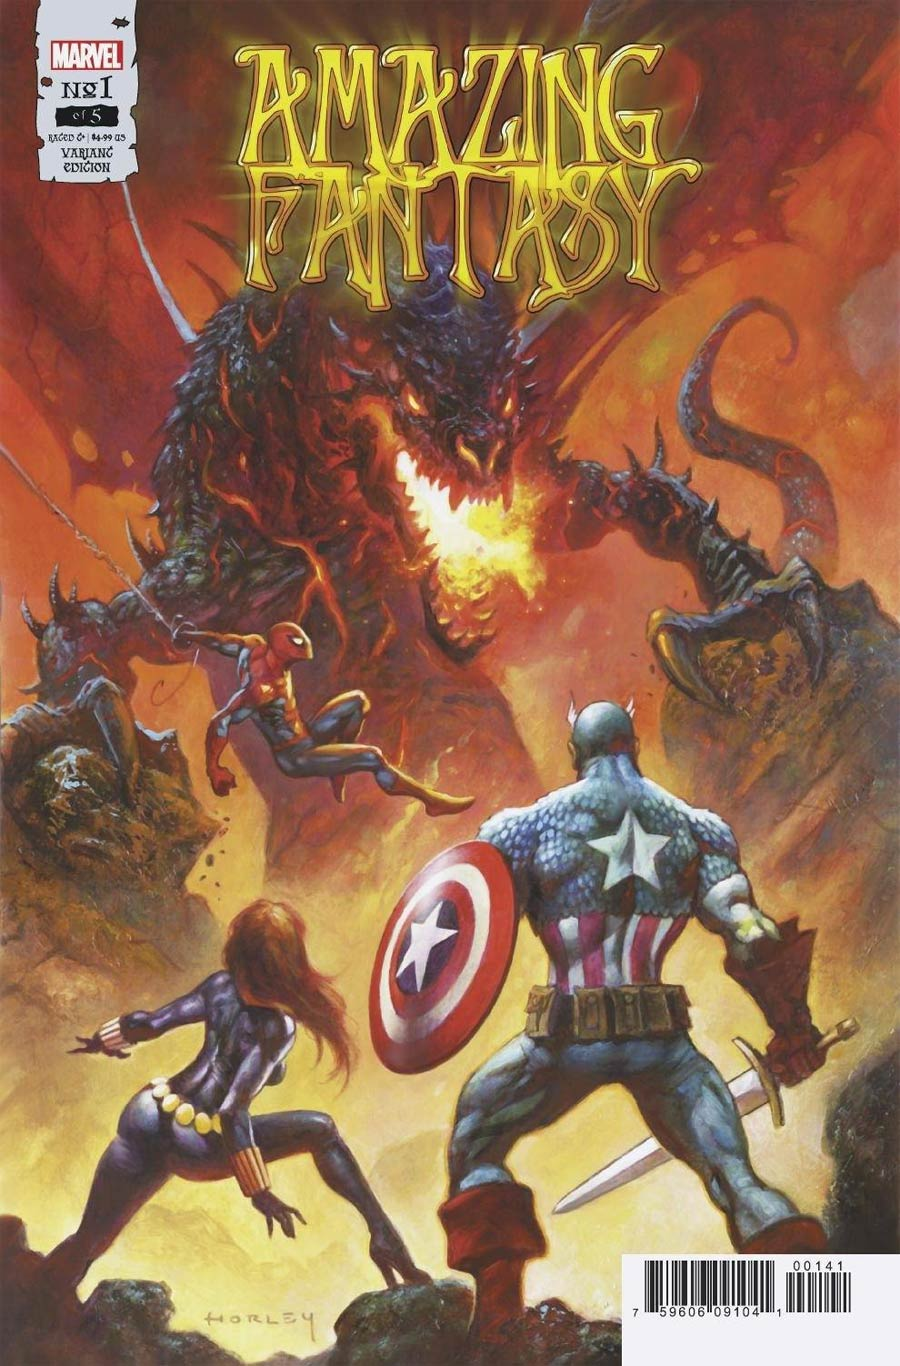 Amazing Fantasy Vol 3 #1 Cover C Incentive Alex Horley Variant Cover